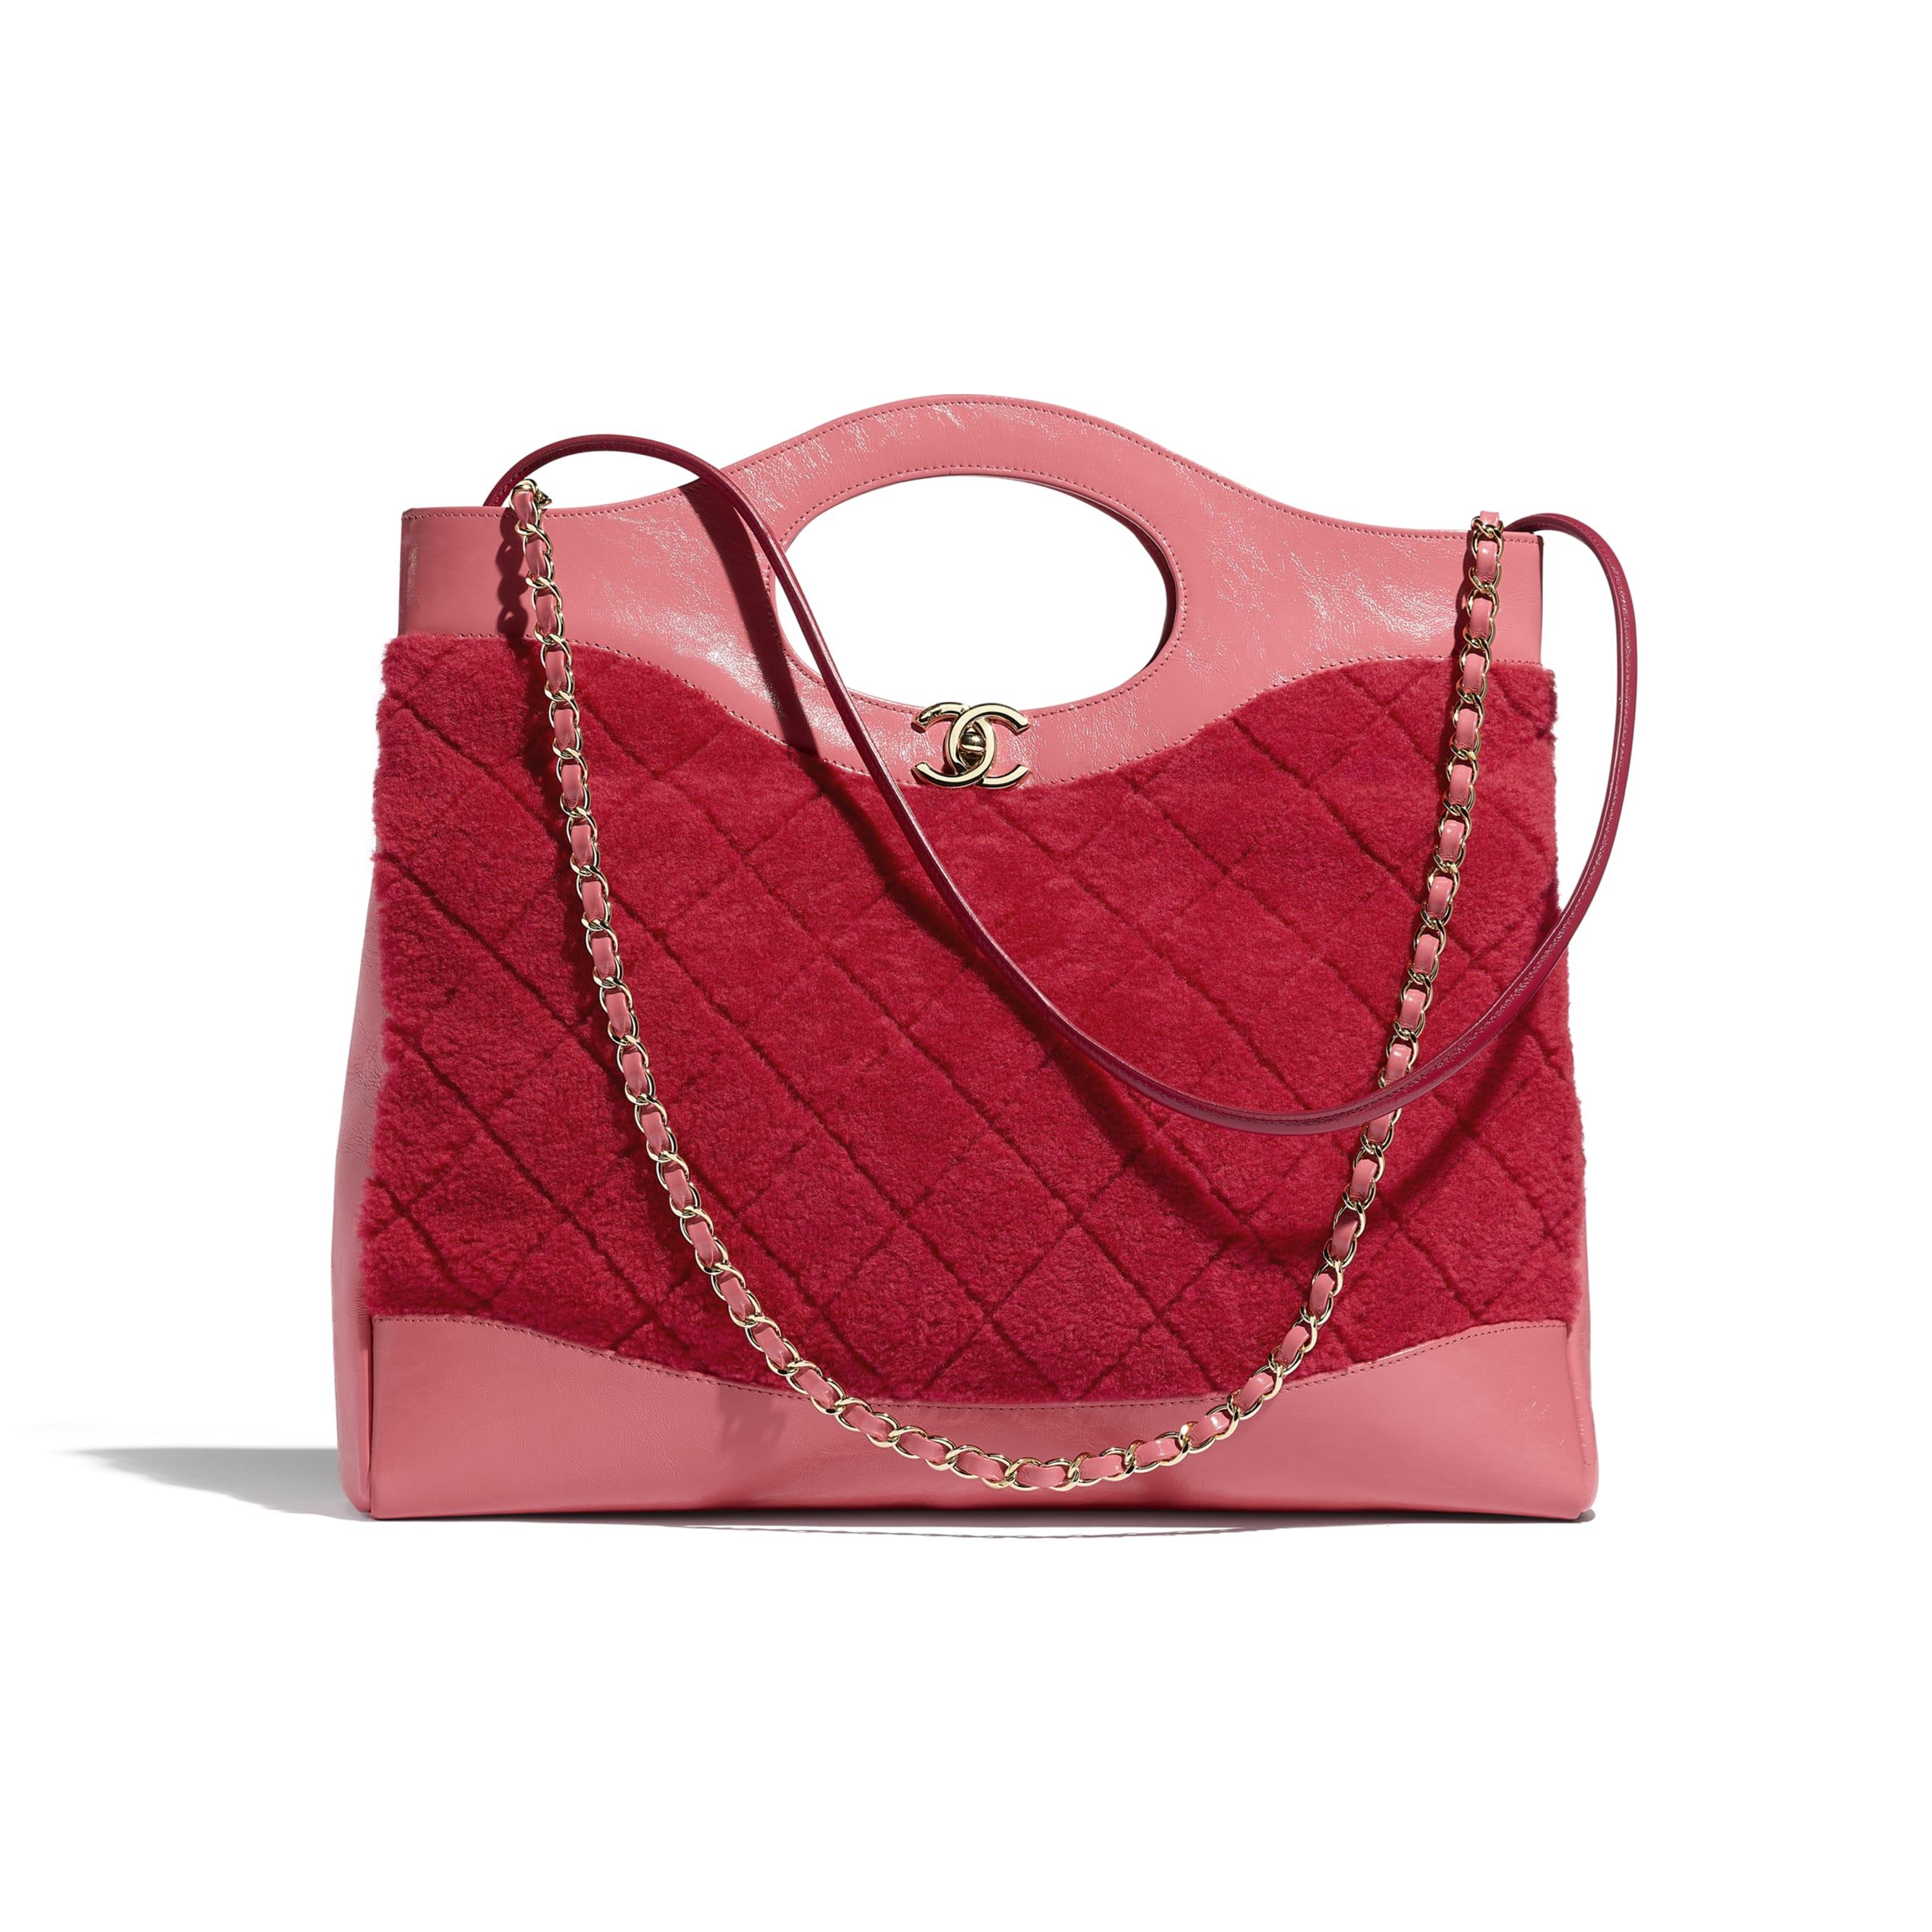 CHANEL 31 Shopping Bag - Red & Pink - Shearling Sheepskin, Calfskin & Gold-Tone Metal - Default view - see standard sized version